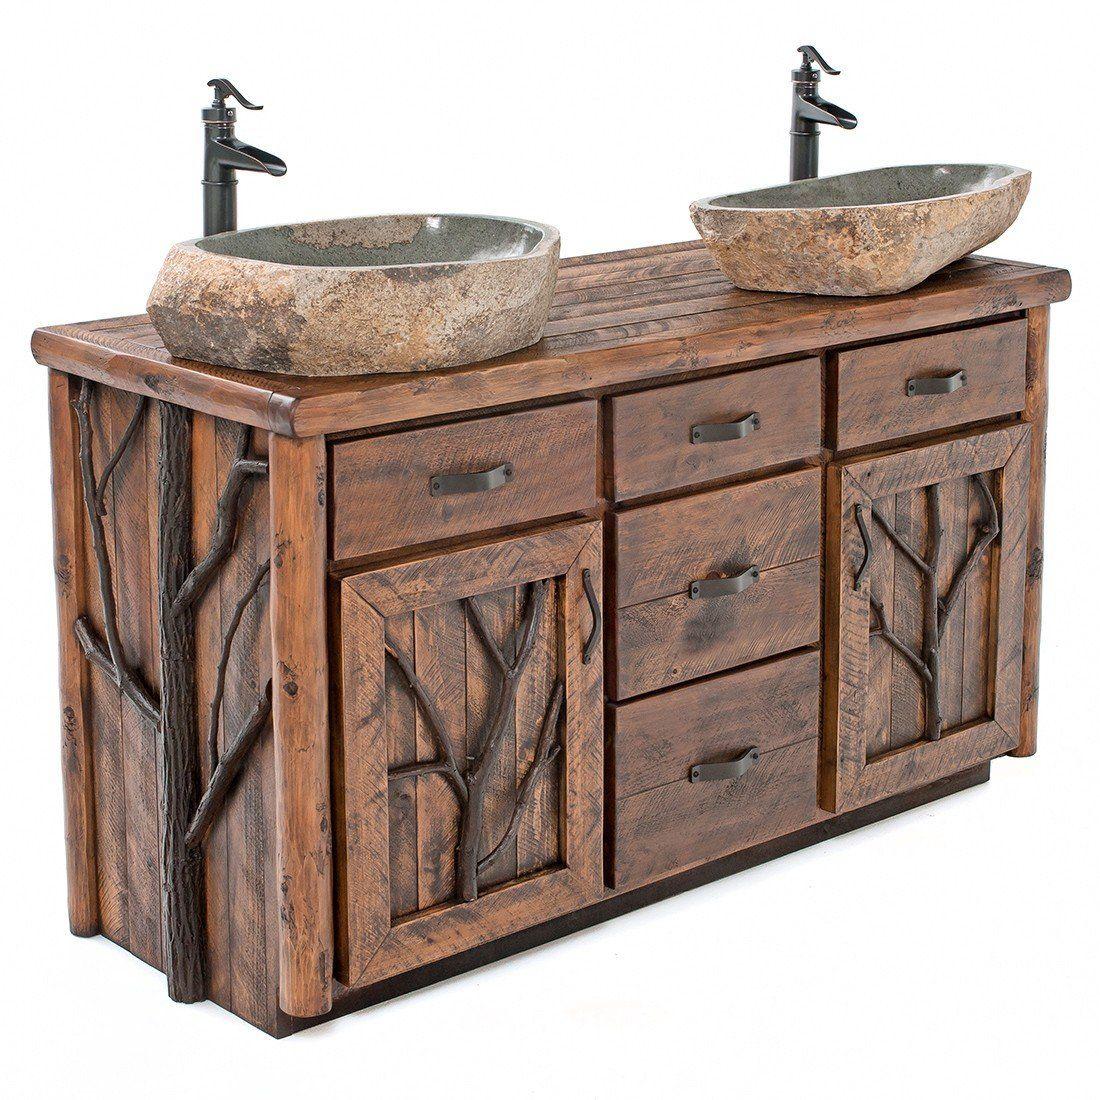 Woodland Forest Log Vanity With Tree Accents 48 To 72 Wide Rustic Bathrooms Rustic Bathroom Sinks Rustic Bathroom Vanities